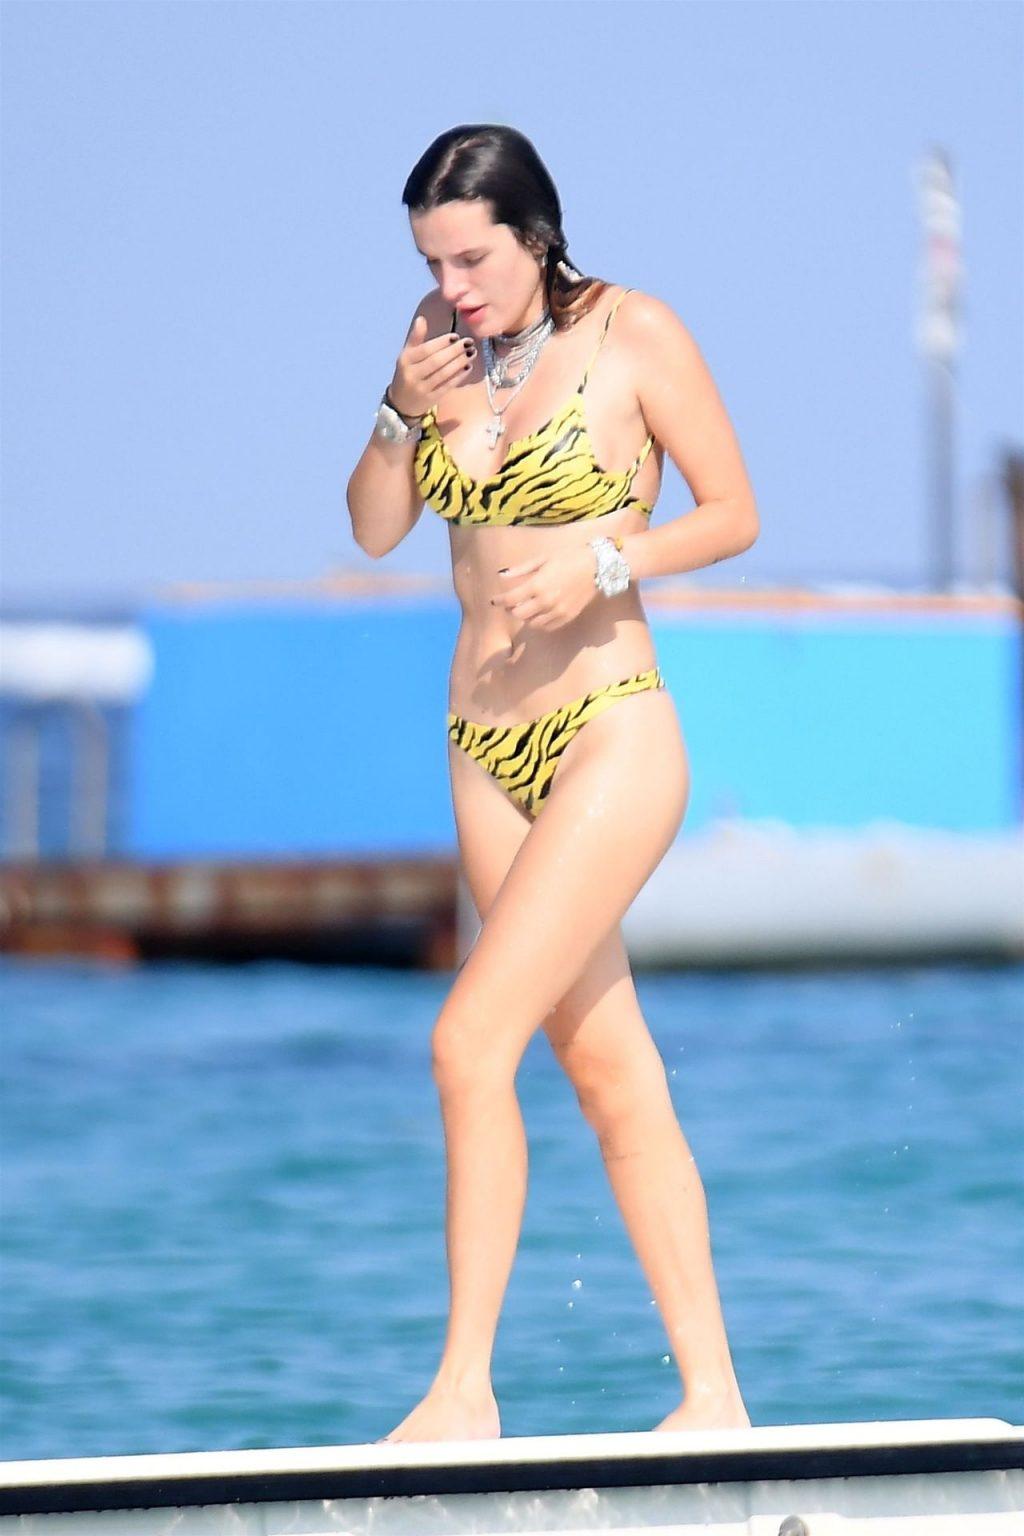 Bella Thorne Sexy Thefappeningblog Com 10 5 1024x1536